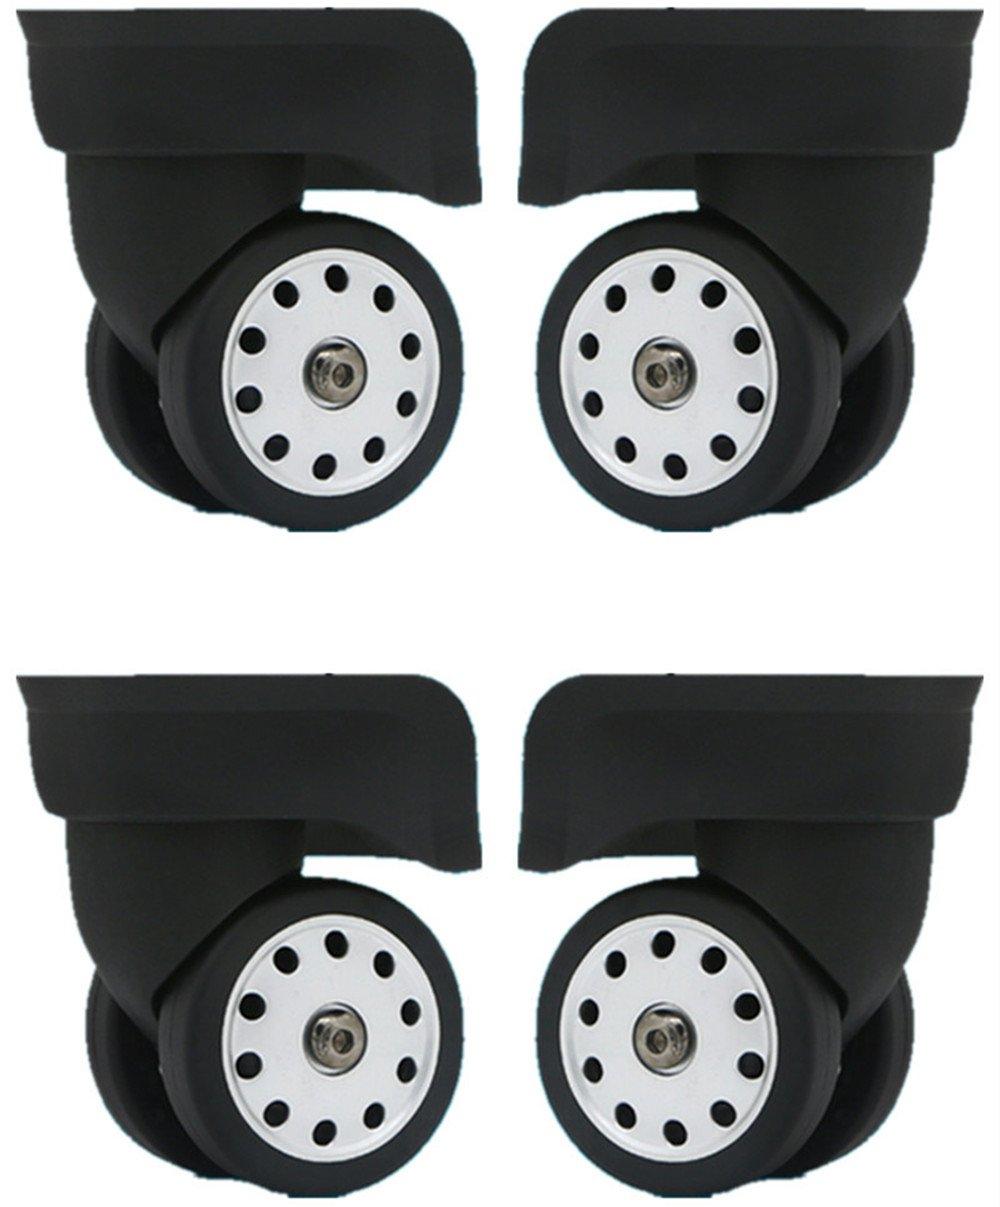 Replacement luggage wheels W046# L Size (Di Long) replacement plastic wheels / luggage spinner wheels (2 pair / set)